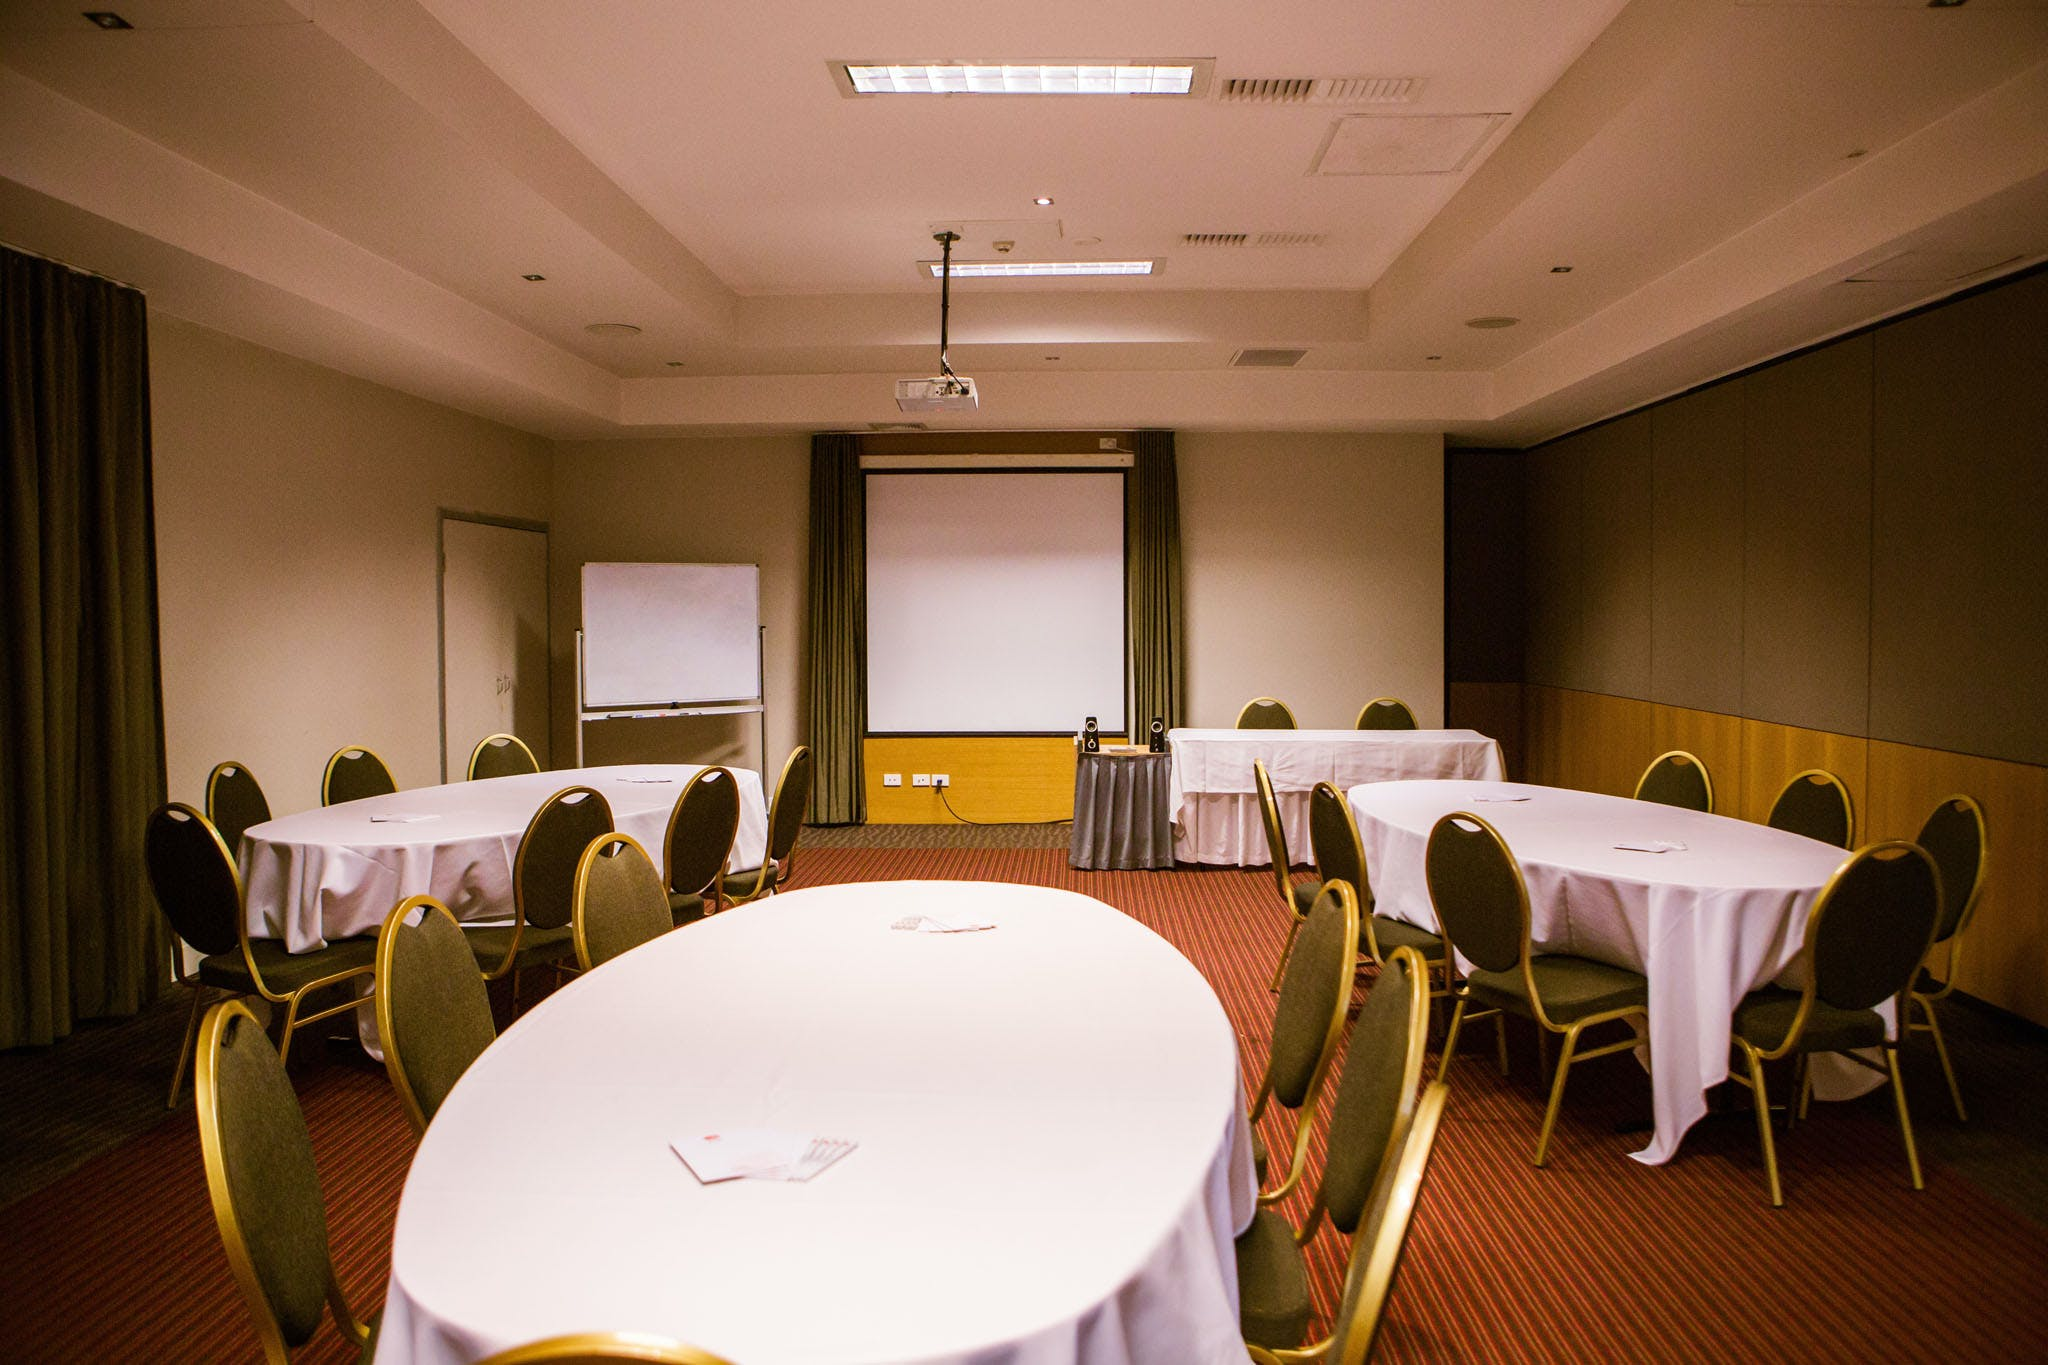 Limestone Room, meeting room at Metro Hotel Ipswich International, image 1